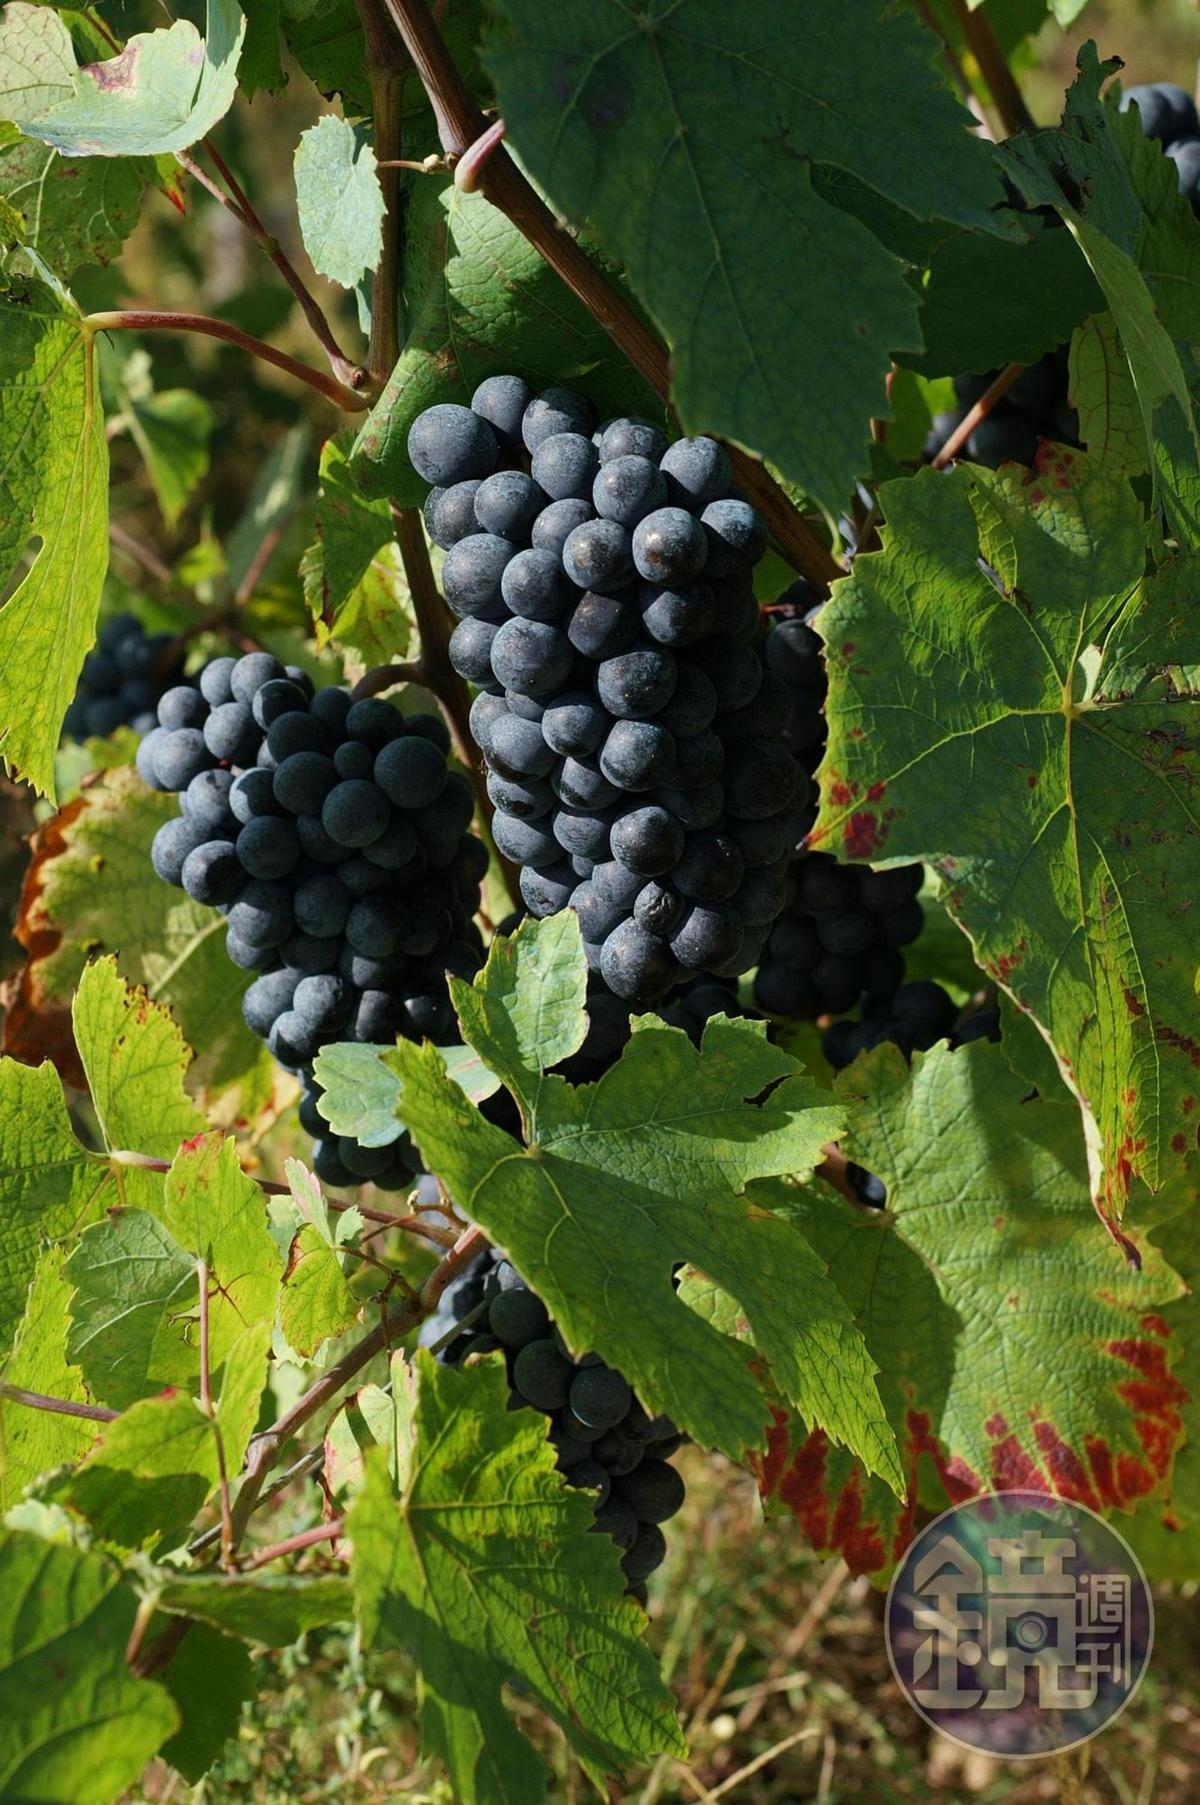 Gamay葡萄向來被視為是平庸較無價值的釀酒品種,但在自然酒尊重各式品種風味的風潮裡賤名翻身,混調時展現了特有風味。(林裕森提供)